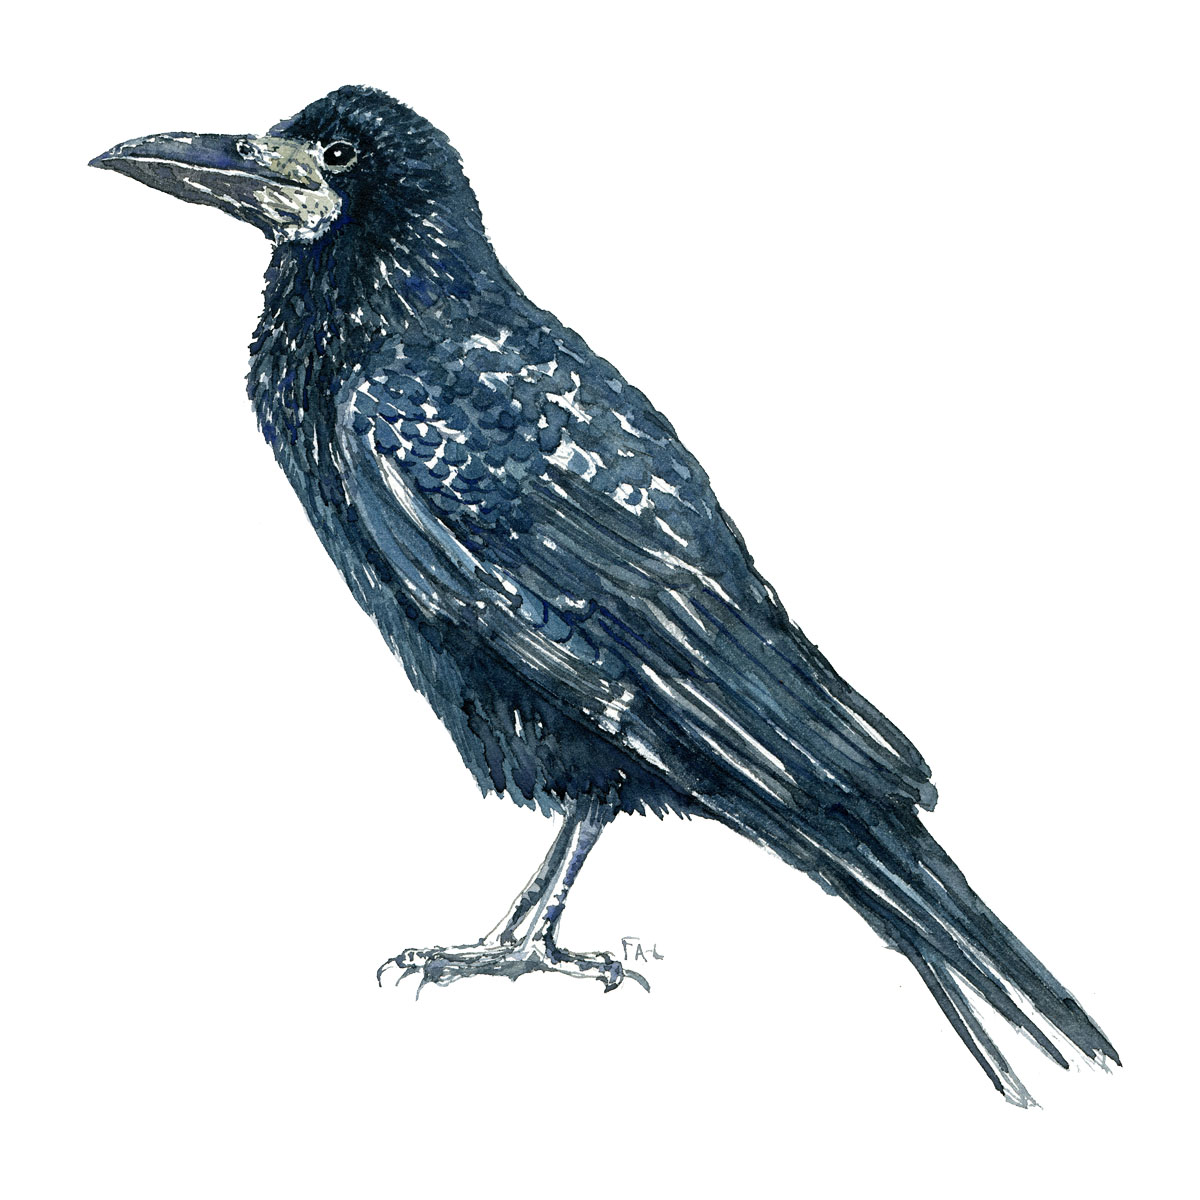 Raage - Rook bird watercolor painting. Artwork by Frits Ahlefeldt. Fugle akvarel